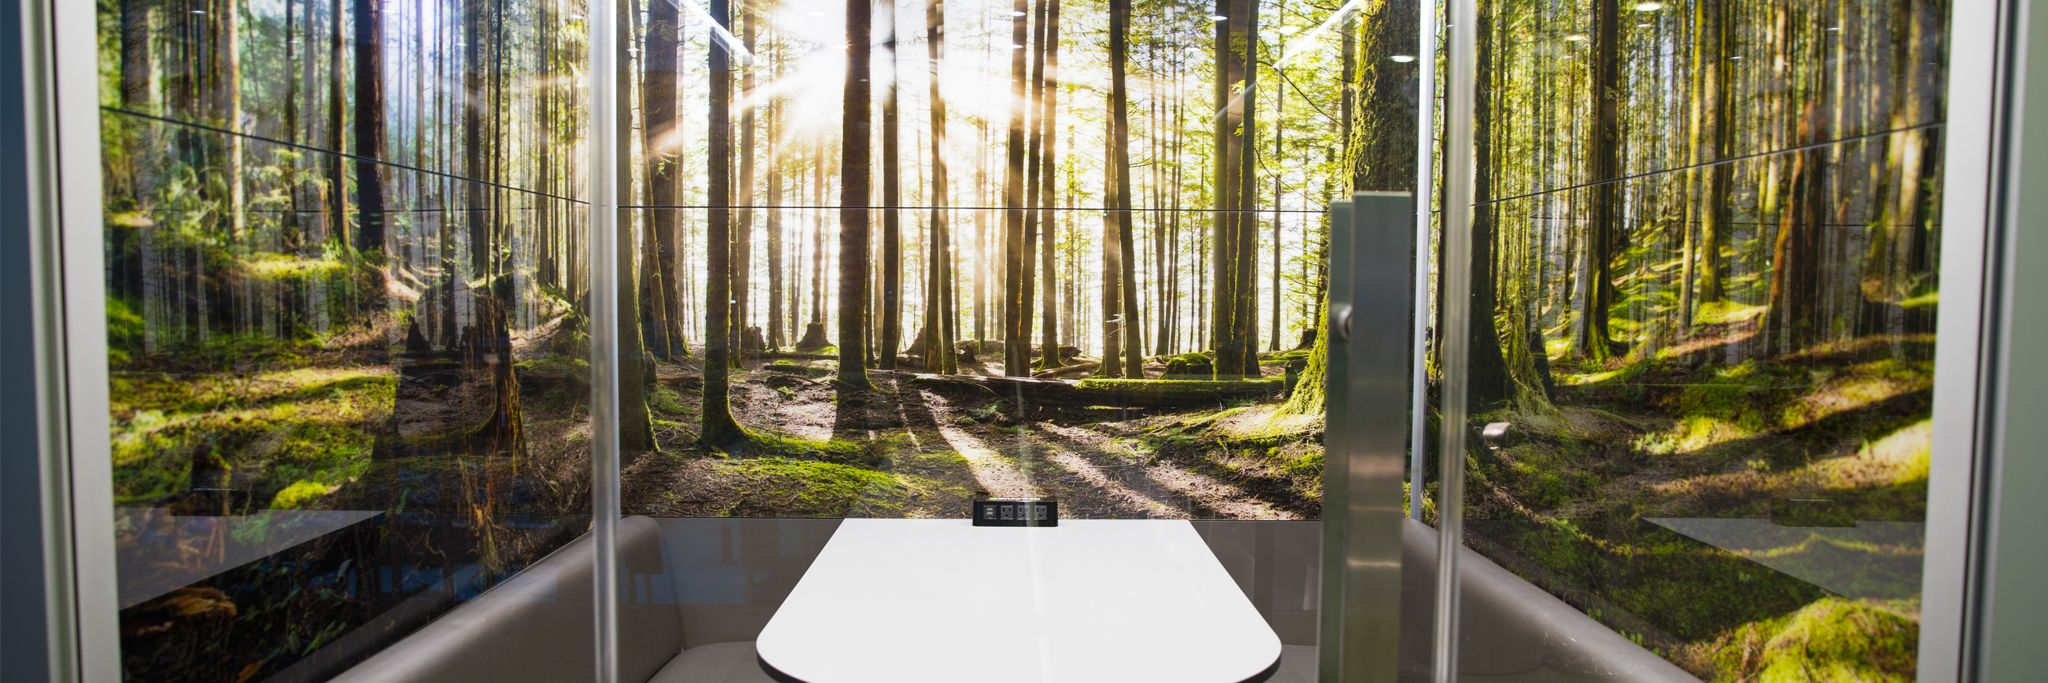 SnapCab® Pod And Portal Installations At Corning Facilities | Collaborative  And Interactive Modular Office Solution | Corning